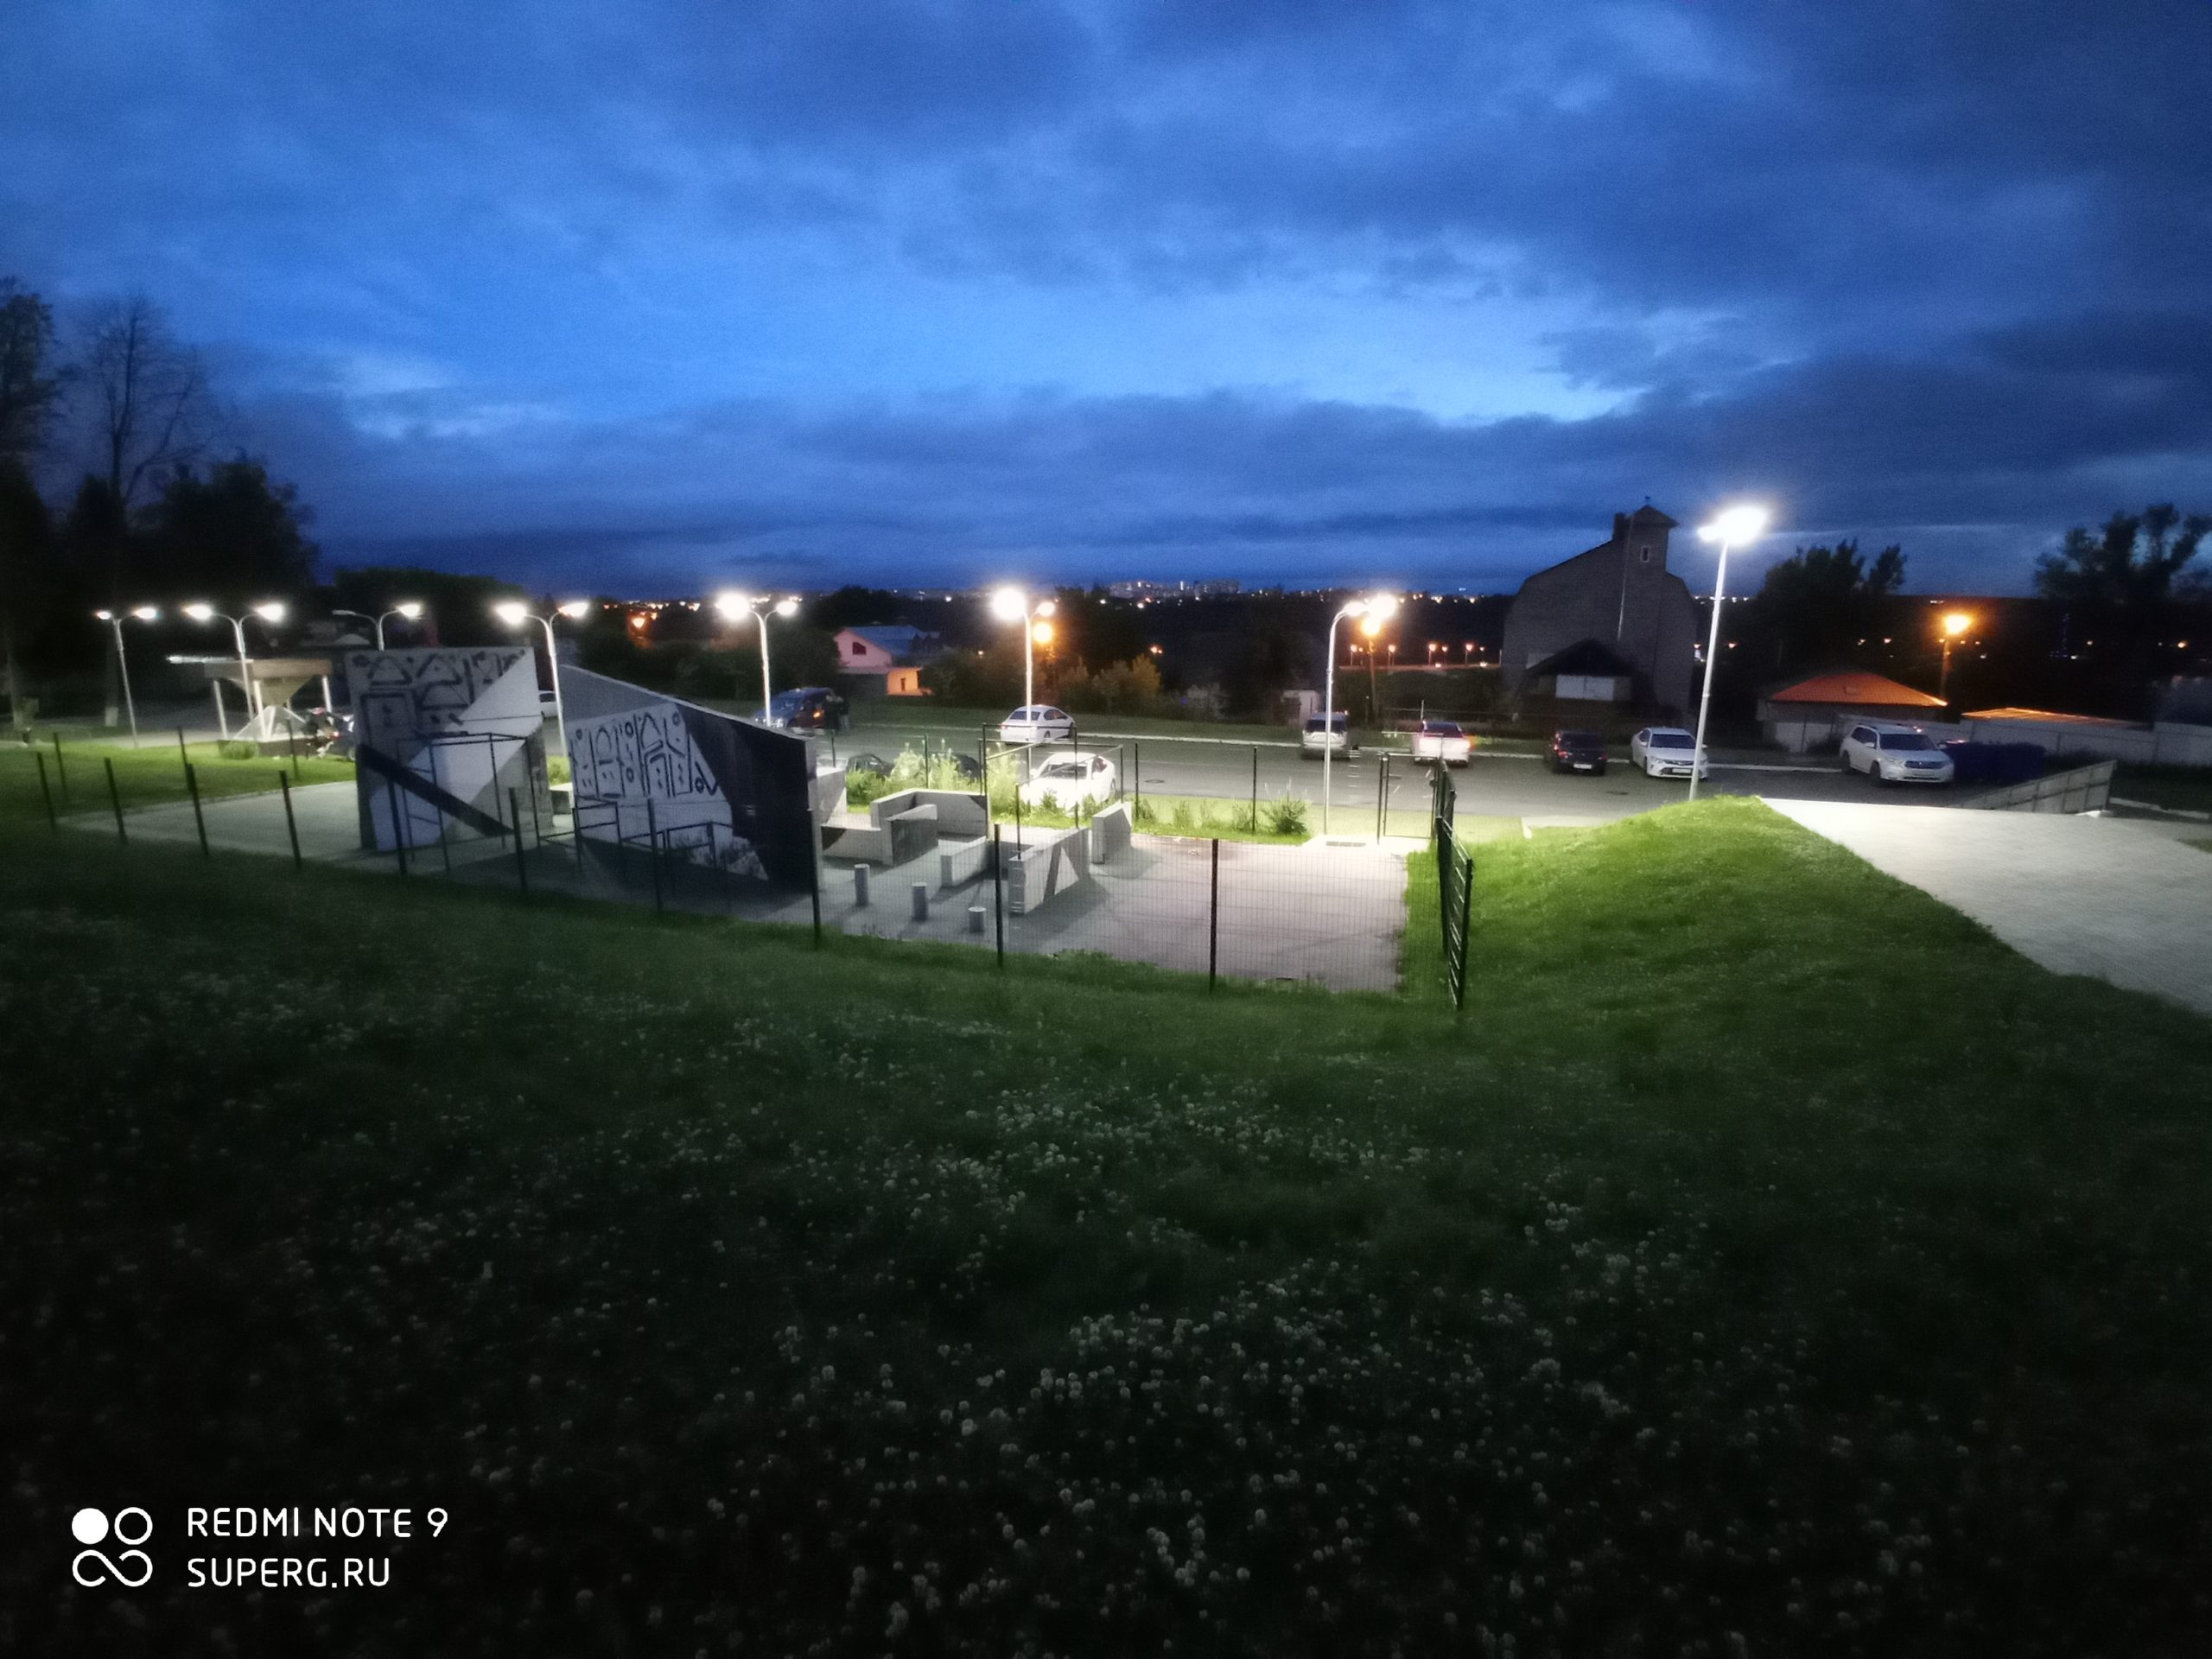 Ночная съёмка на широкоугольную камер у Redmi Note 9